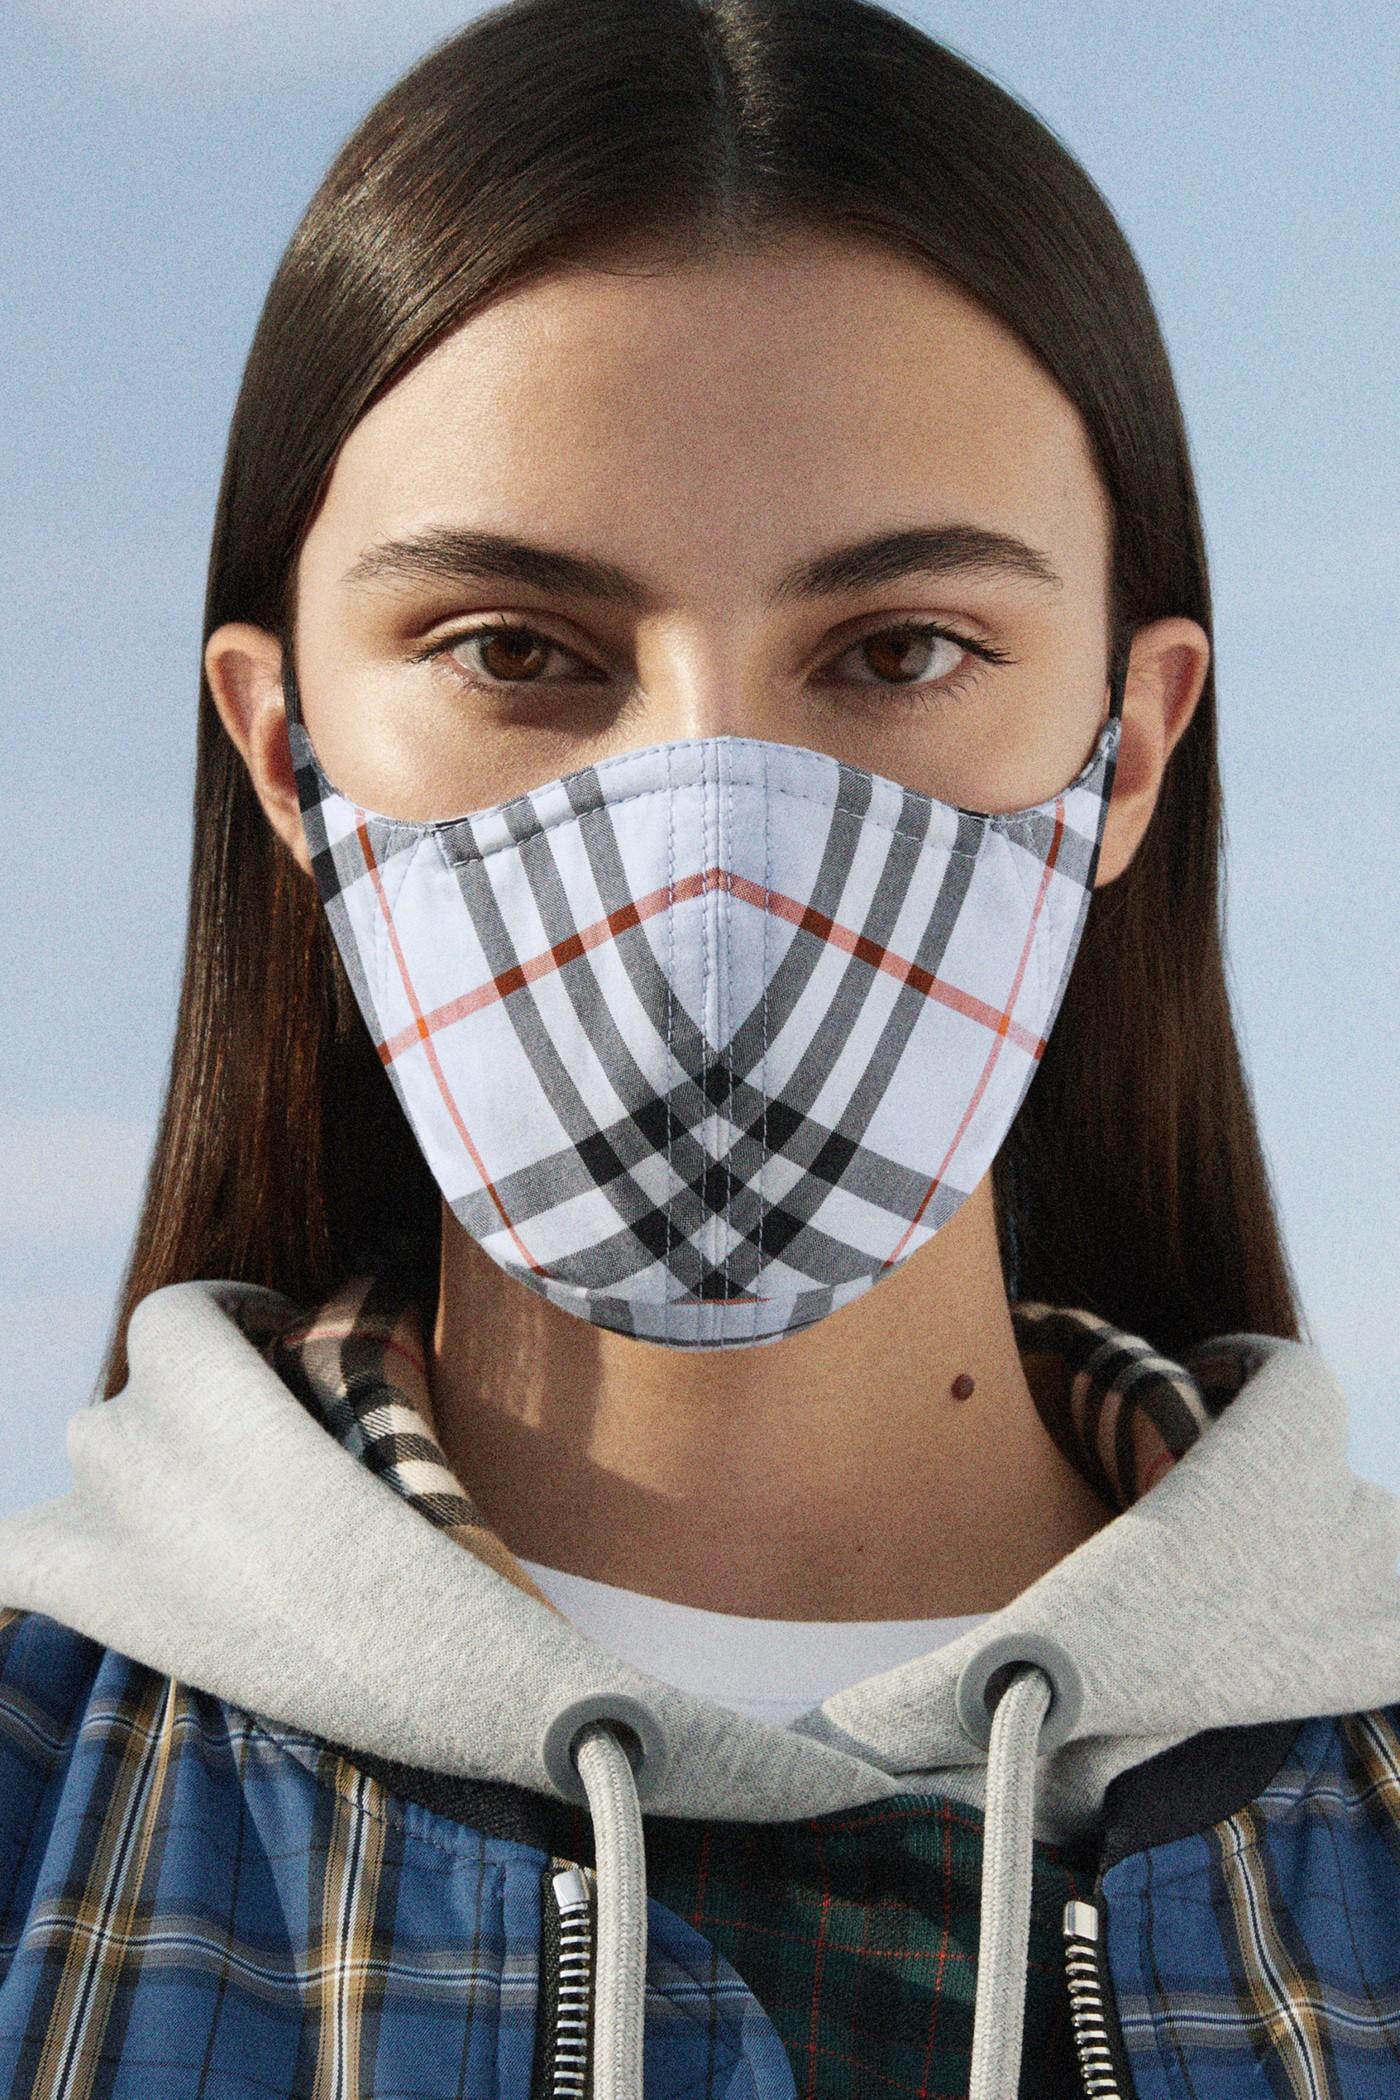 burberry vintage check face mask ppe reusable charity donation coronavirus covid-19